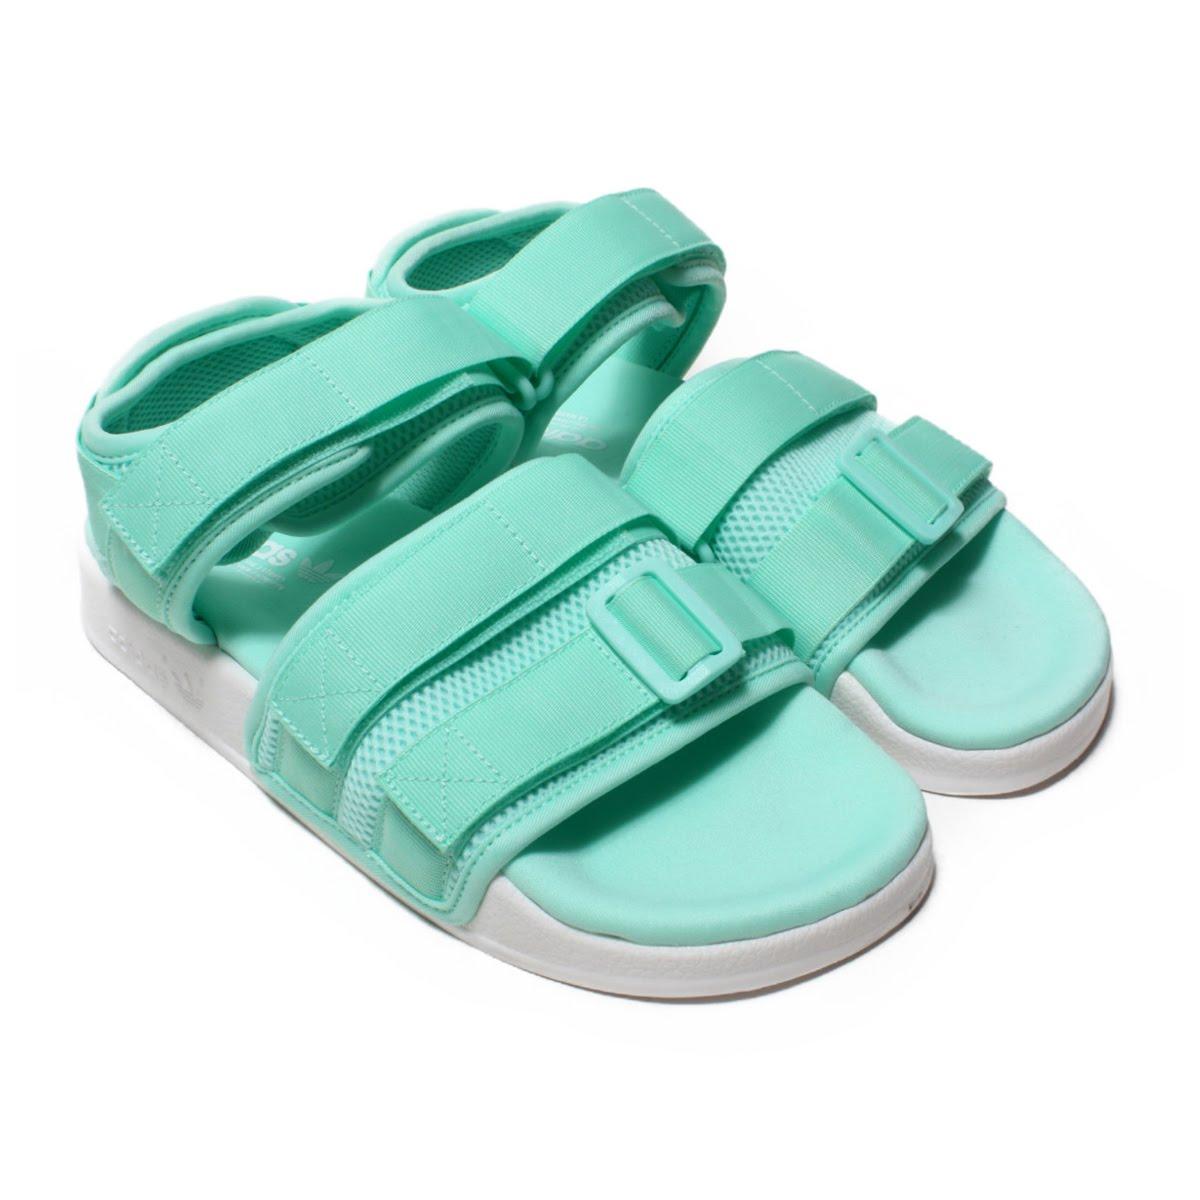 bf648a99f317 adidas Originals Adilette Sandal 2.0 W(愛迪達原始物阿迪萊塔涼鞋2.0W)Clear Mint Running  White Running White 18FW-I